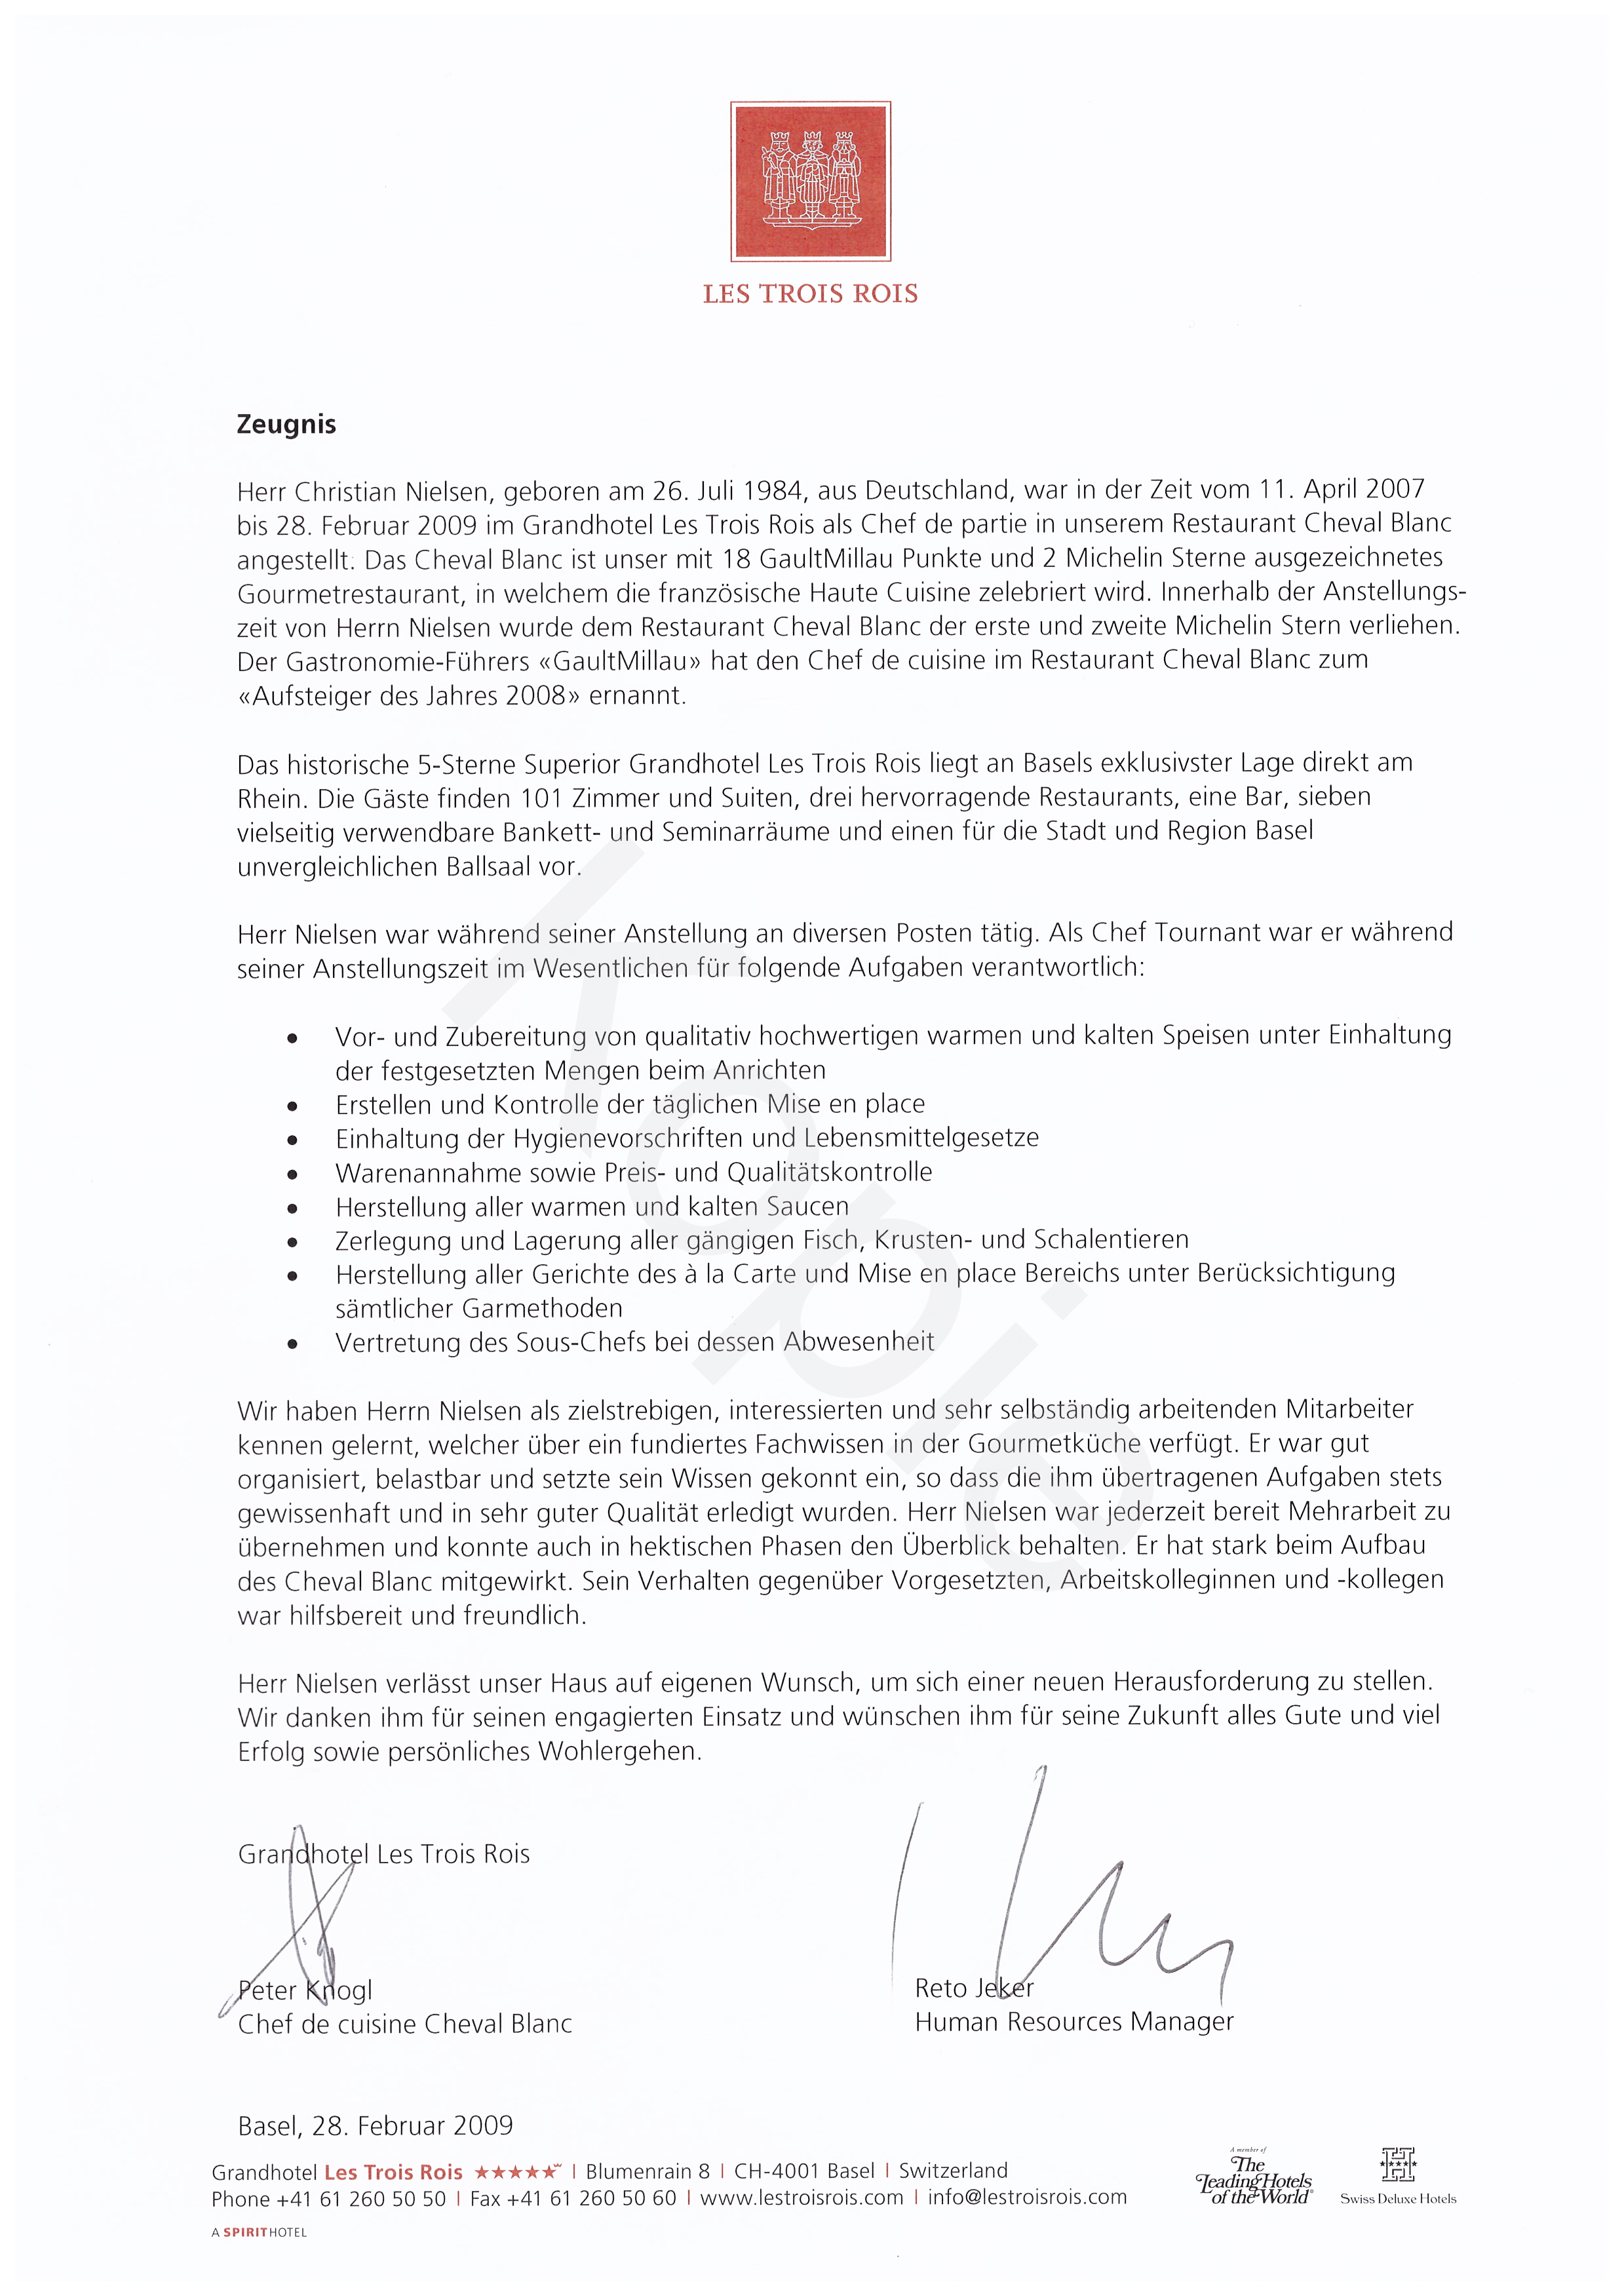 Englisch B2 Zertifikat Hamburg Alpina Farbe Angebot Real